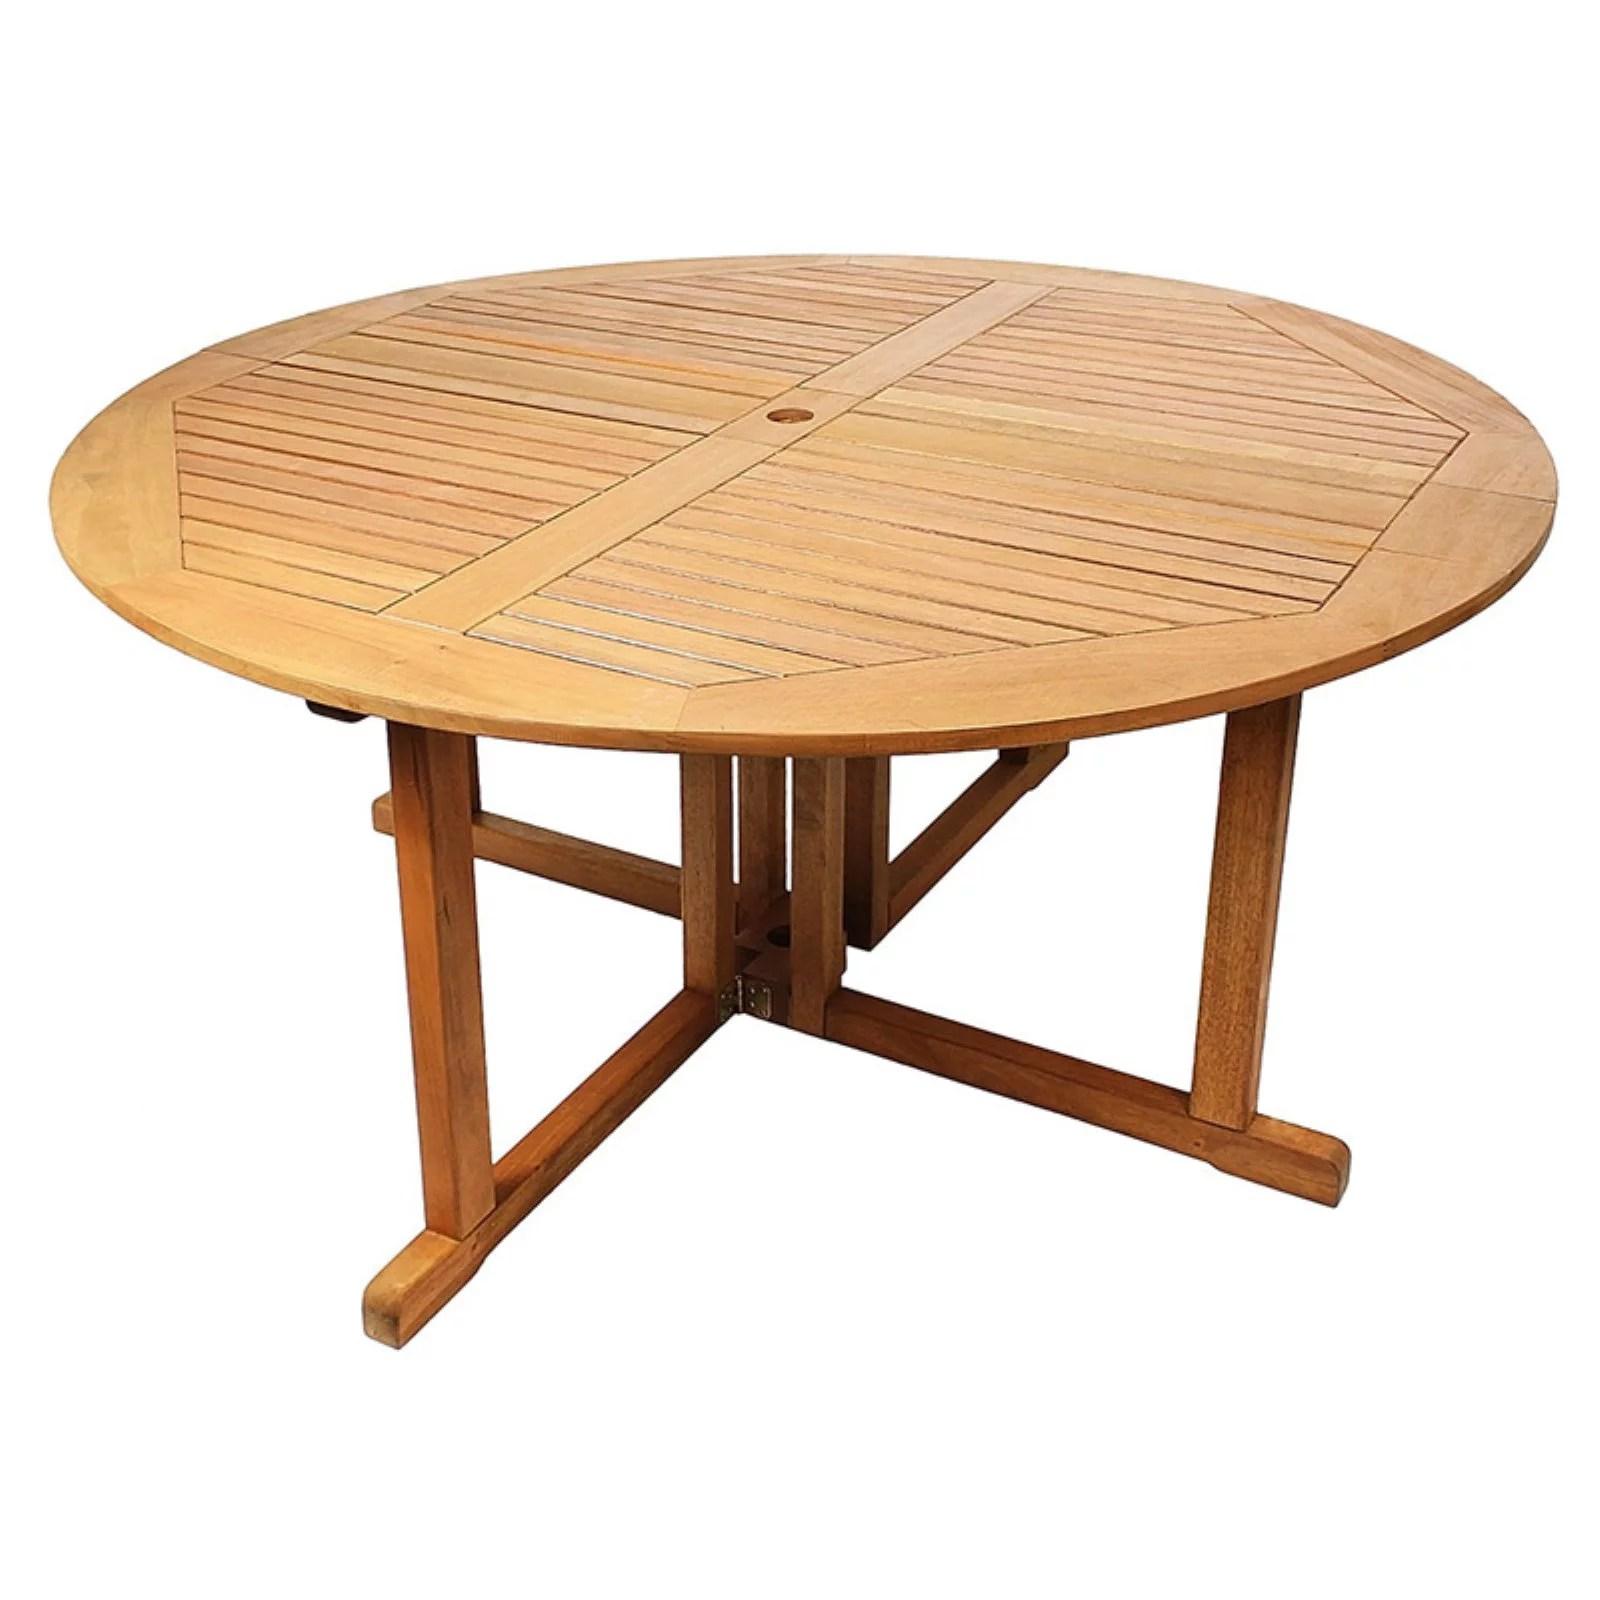 achla designs folding dining table walmart on Circular Folding Dining Table id=71767